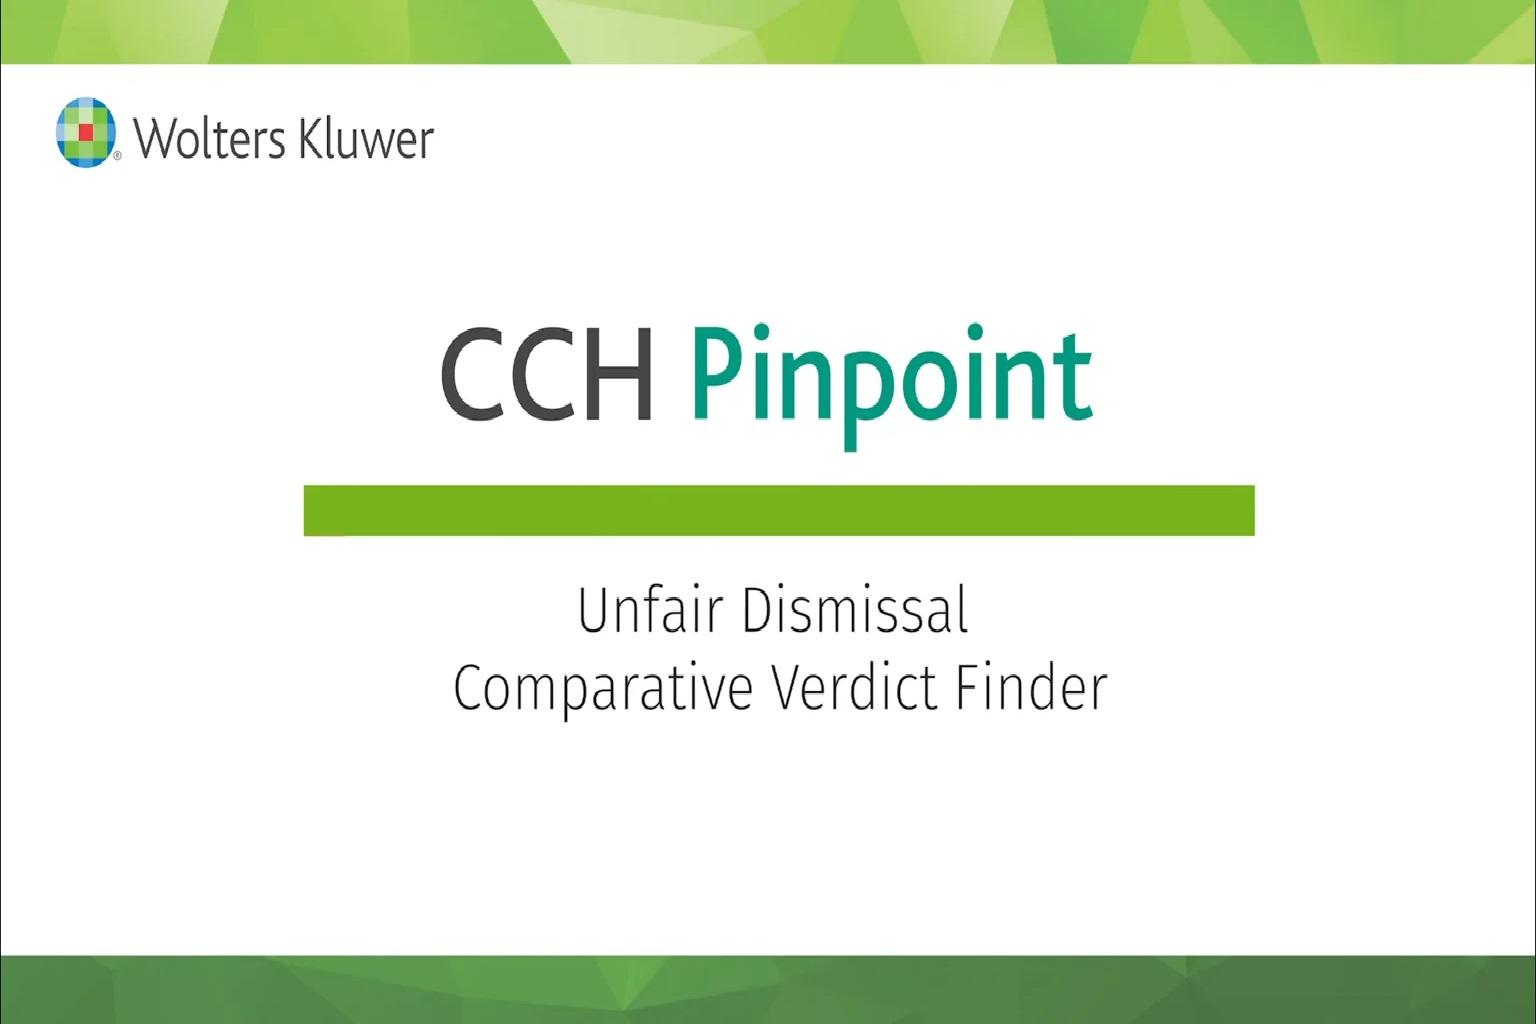 Unfair Dismissal – Comparative Verdict Finder